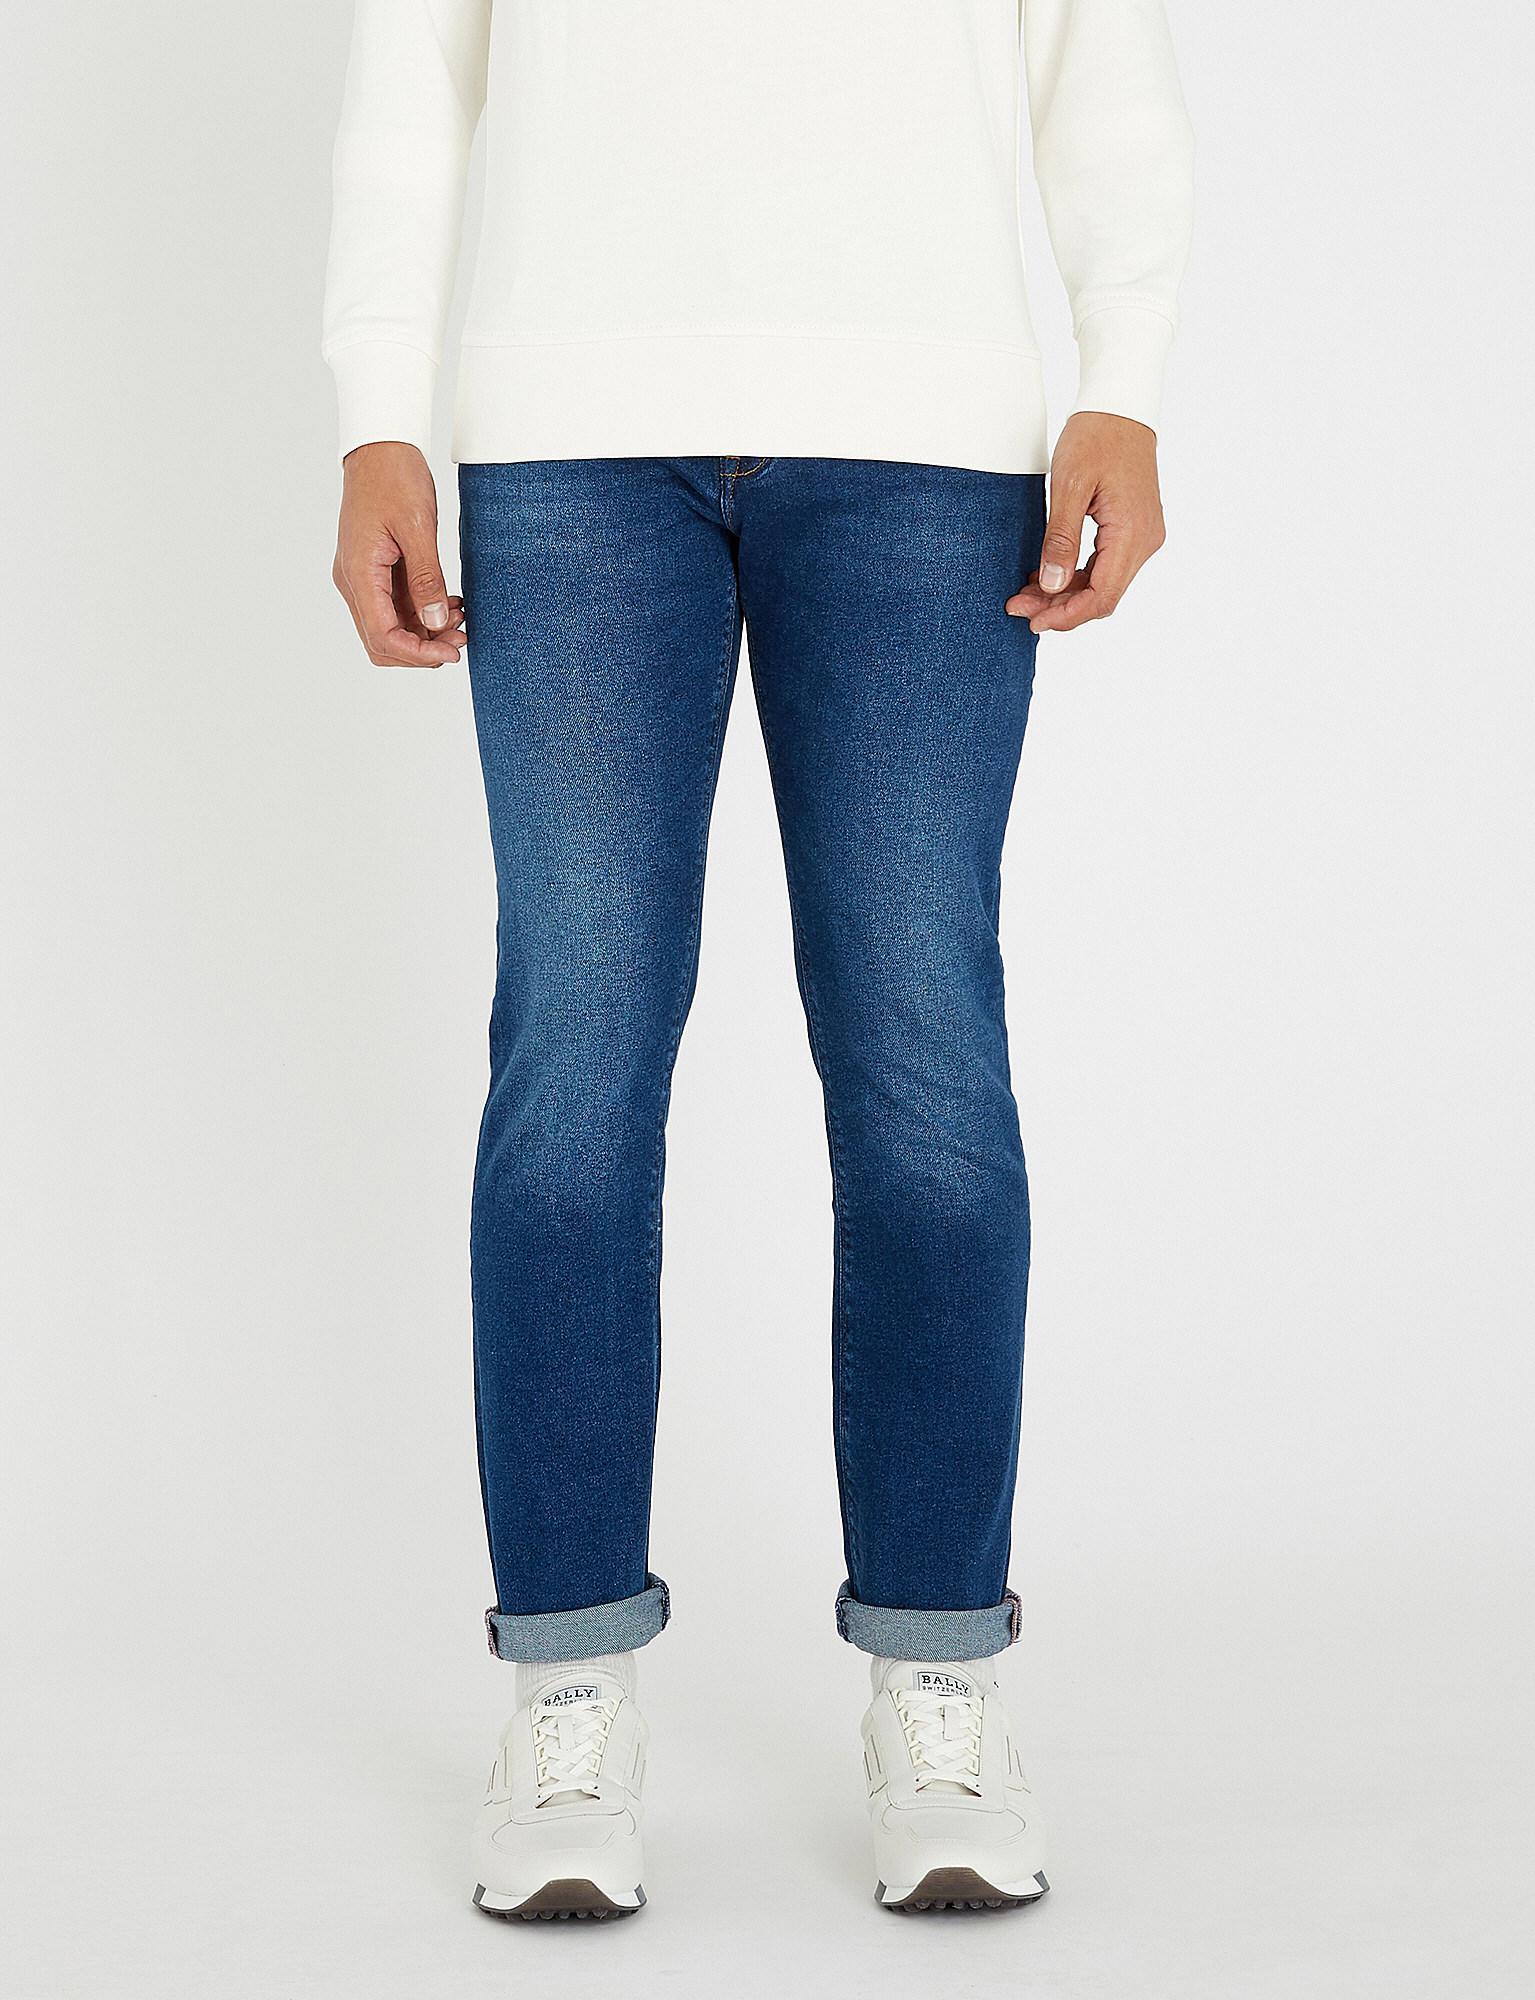 6564fb75 Tommy Hilfiger Bleecker Slim-fit Skinny Jeans in Blue for Men - Lyst